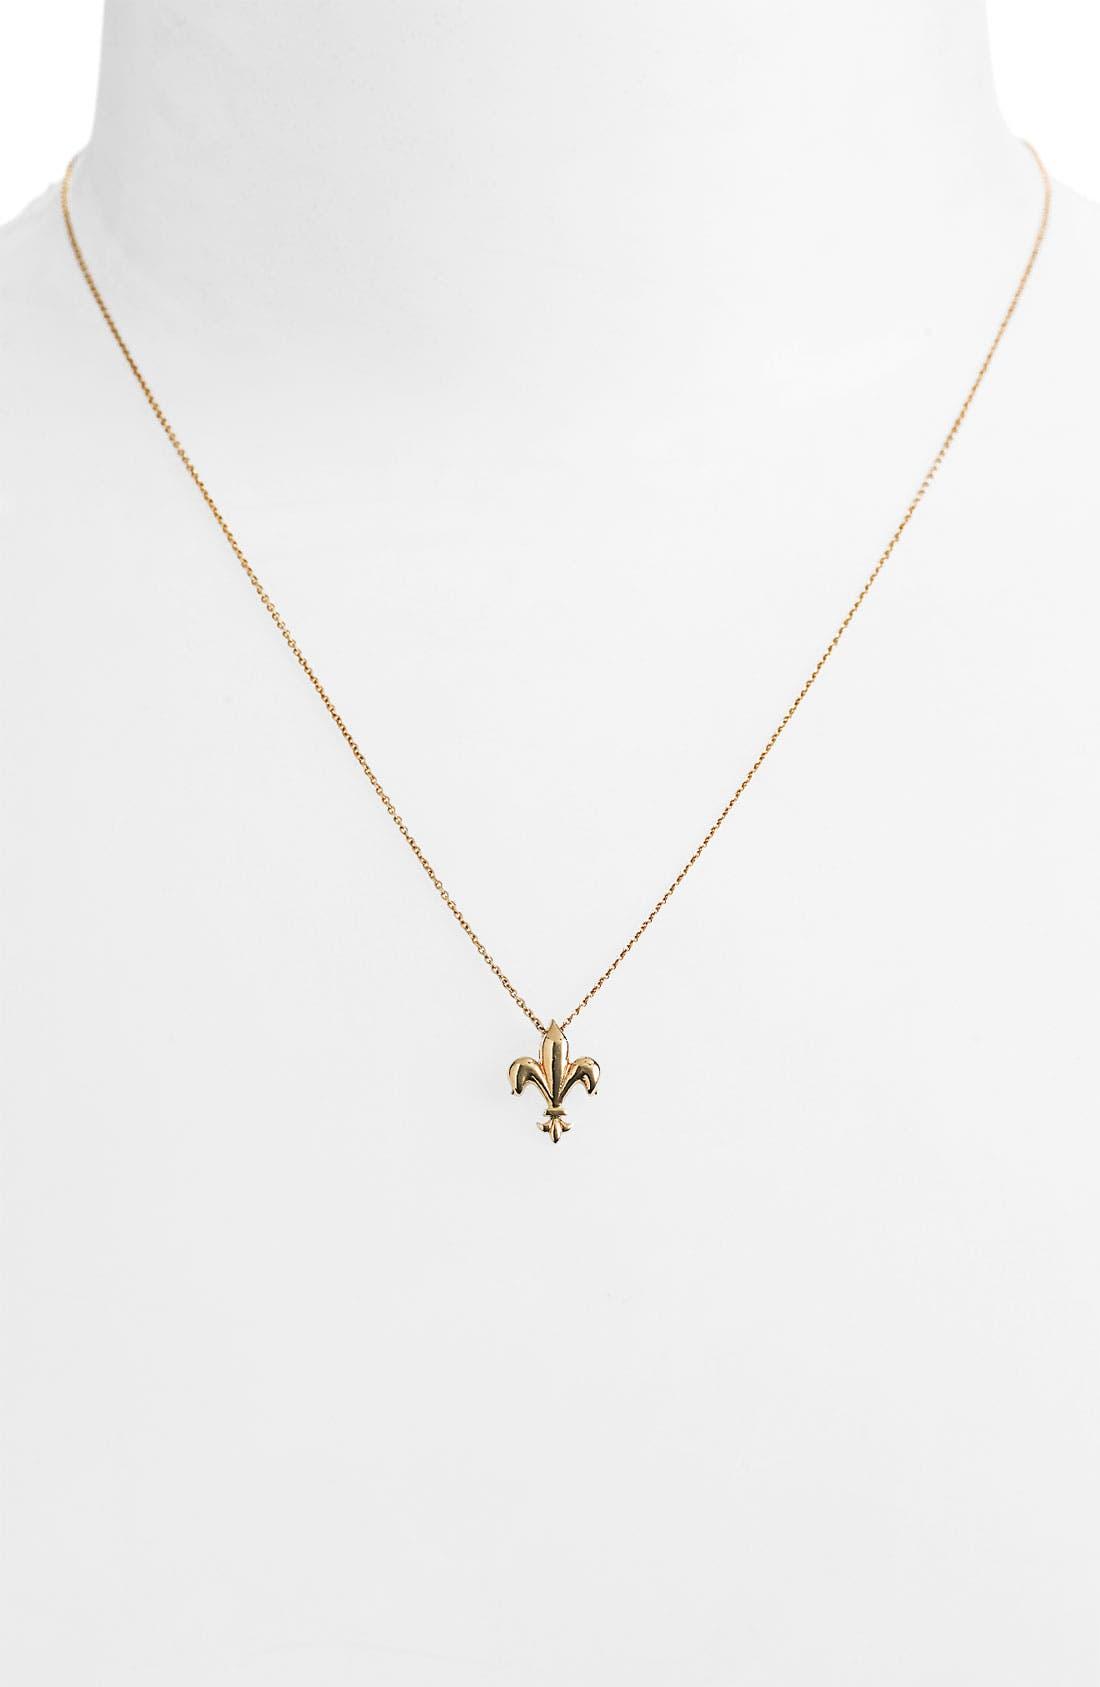 Main Image - Roberto Coin 'Tiny Treasures' Fleur de Lis Necklace